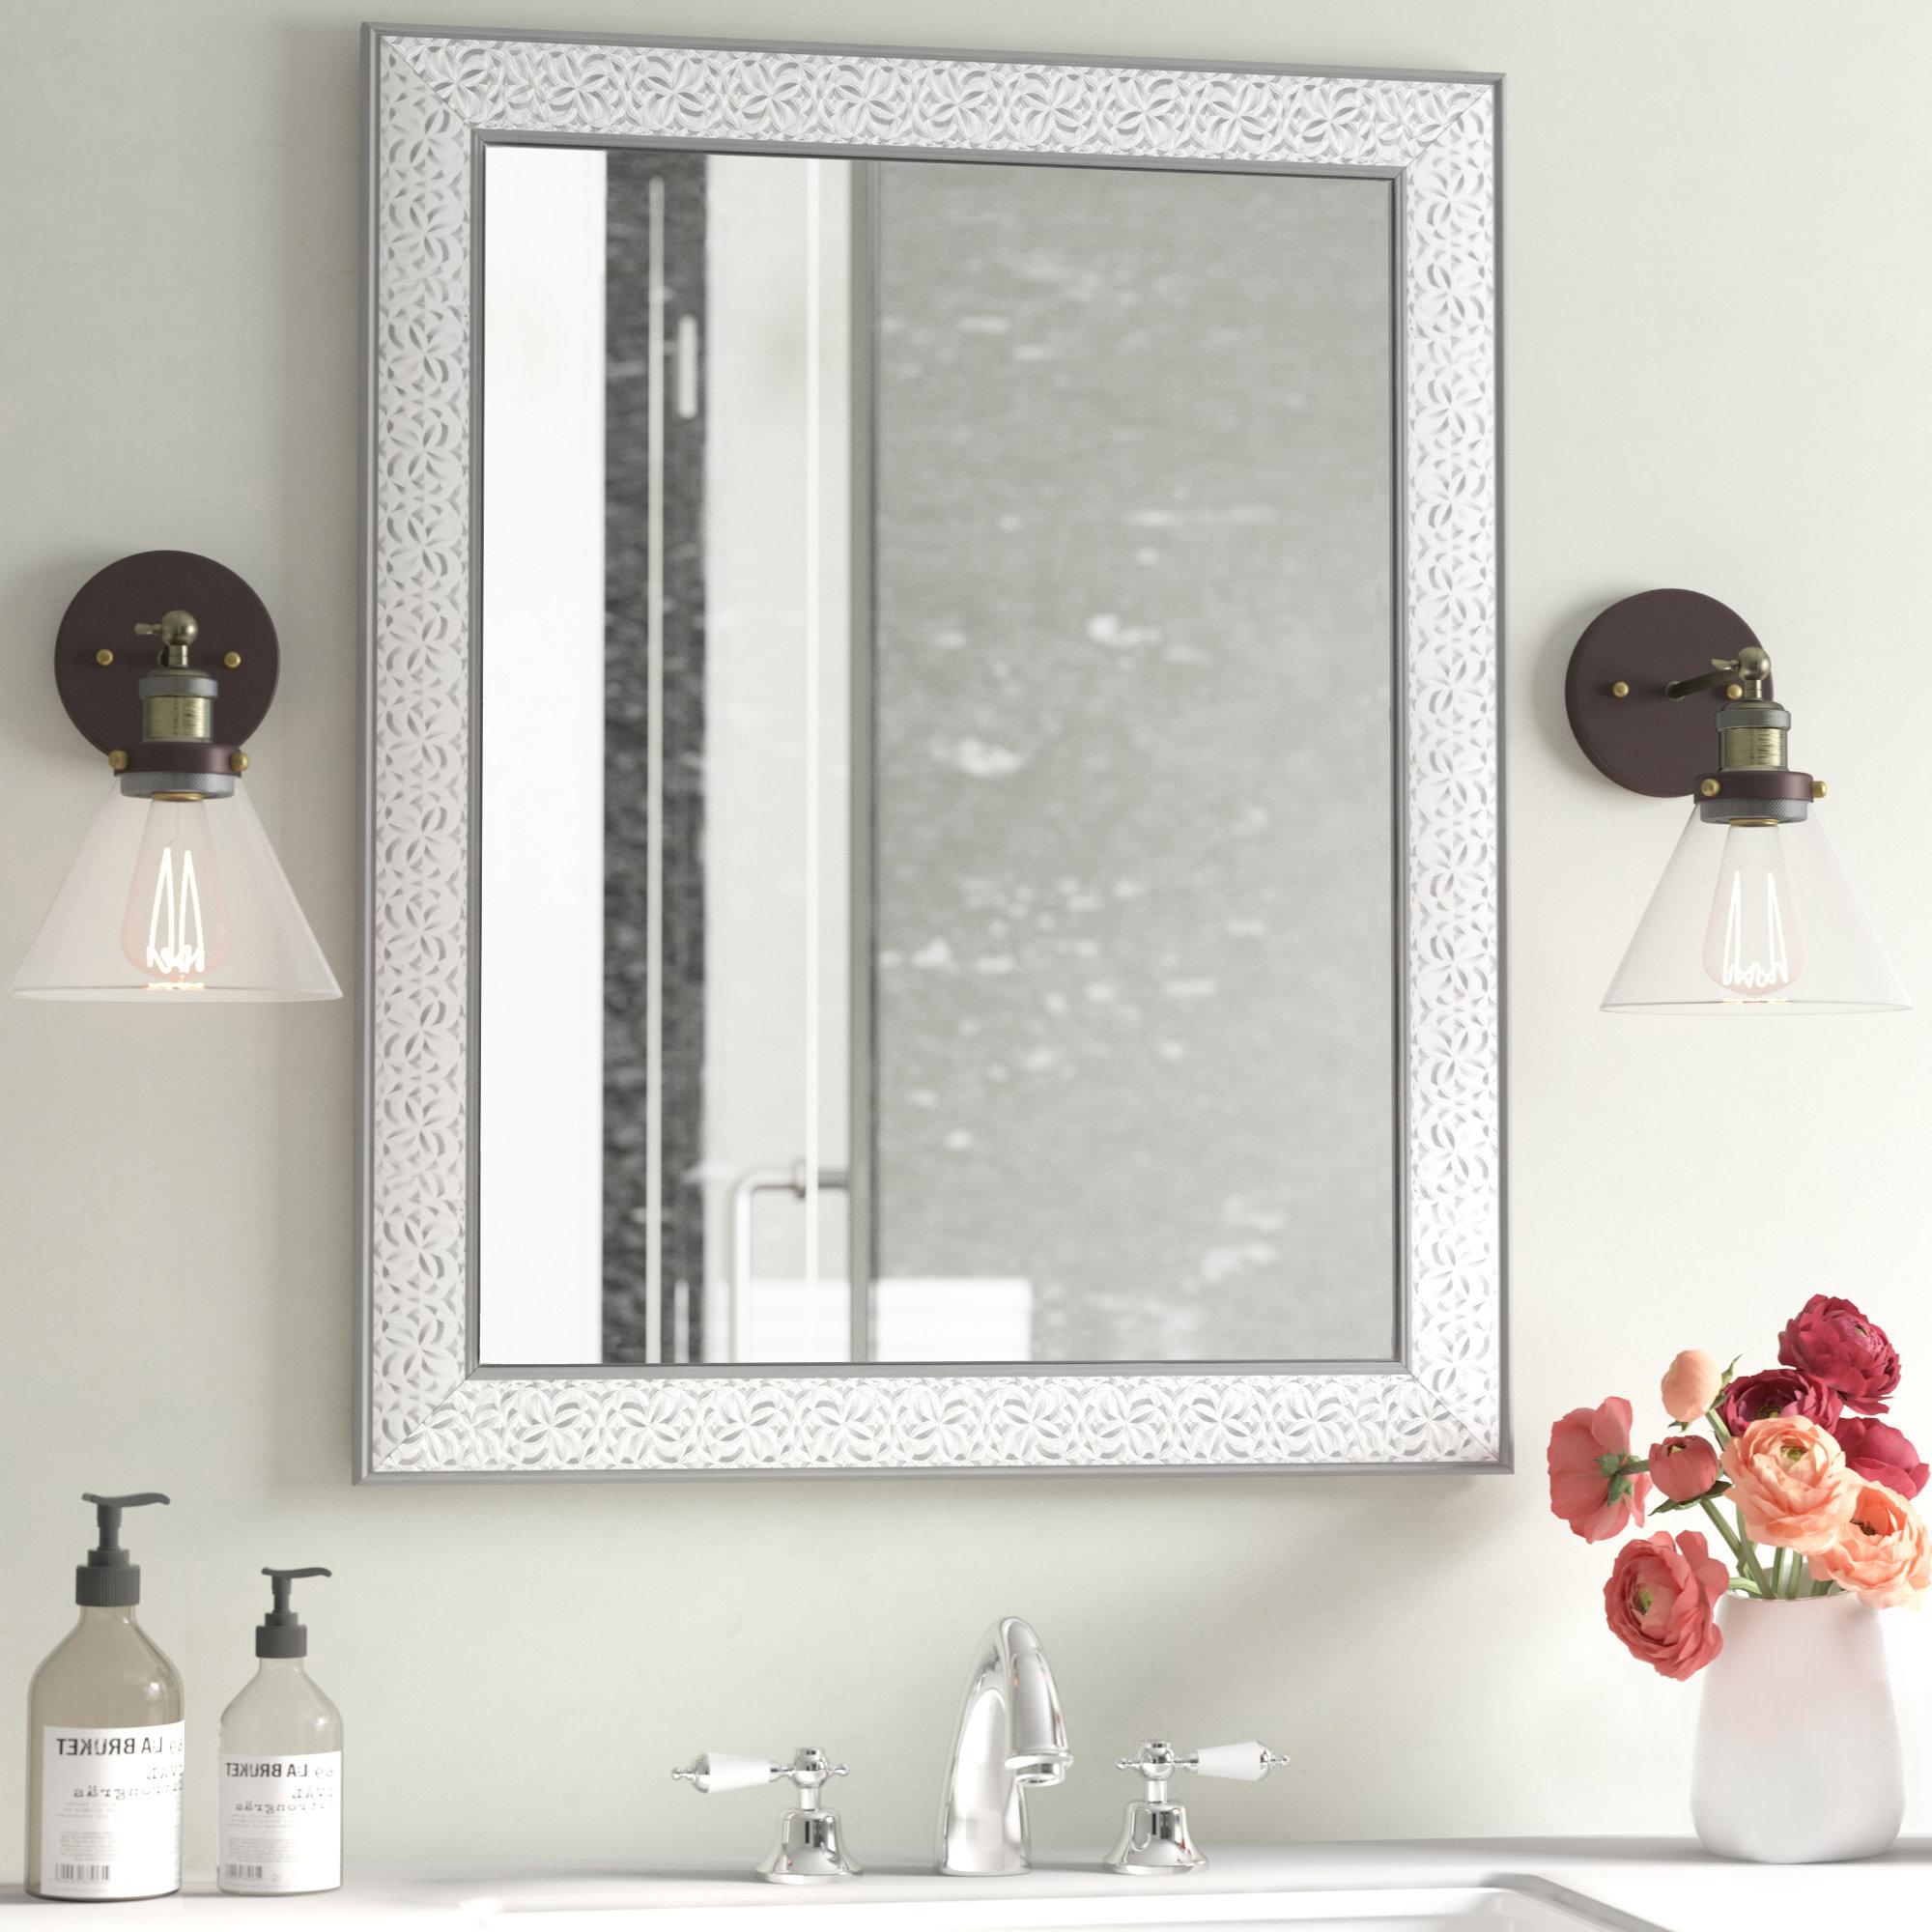 Encanto Modern & Contemporary Beveled Bathroom/vanity Mirror Inside Most Up To Date Modern & Contemporary Beveled Overmantel Mirrors (Gallery 3 of 20)